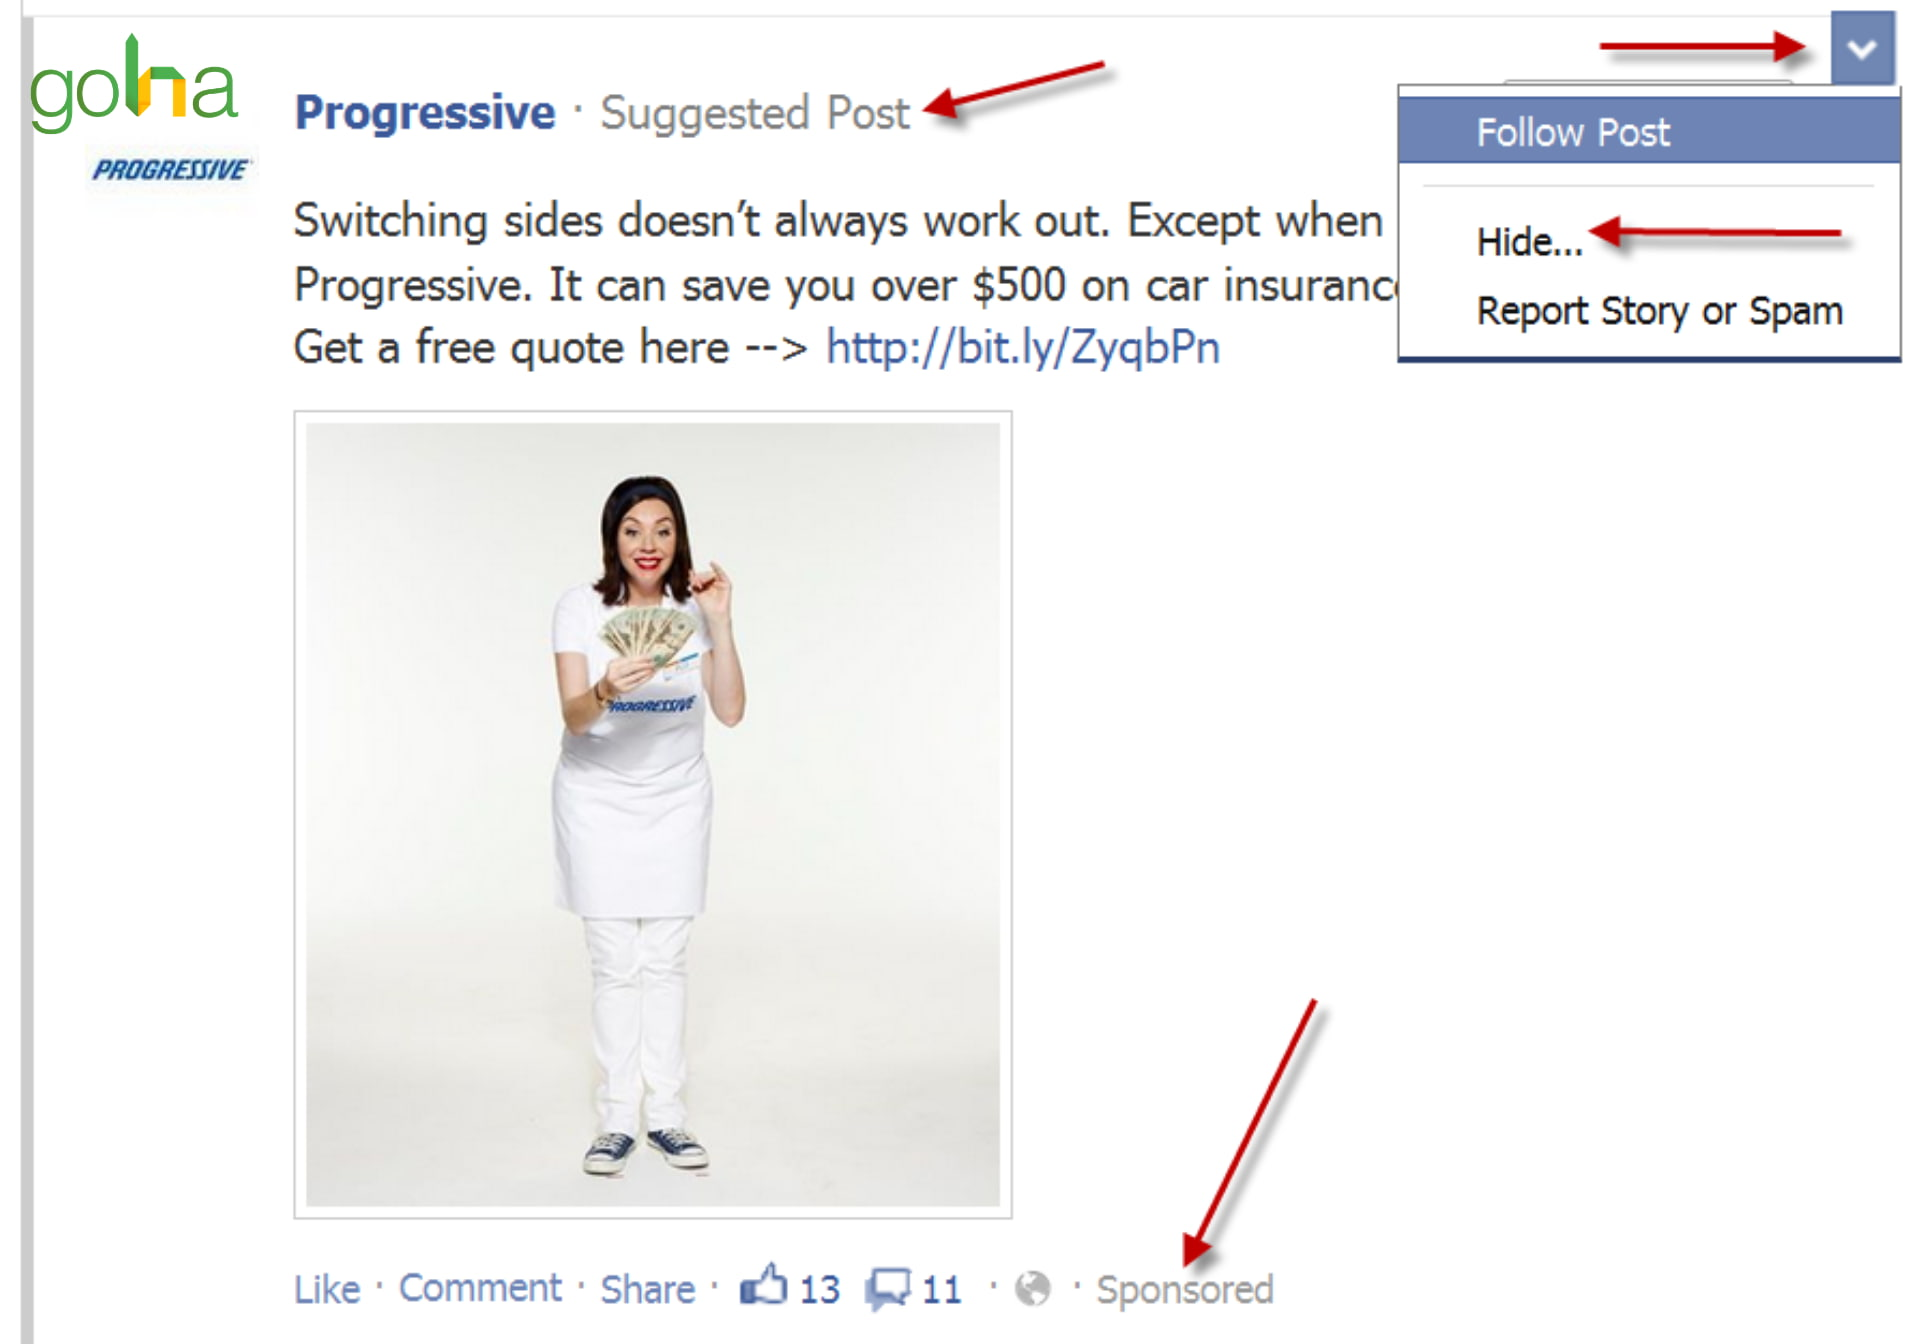 suggested-post-la-mot-dang-facebook-ads-vo-cung-pho-bien